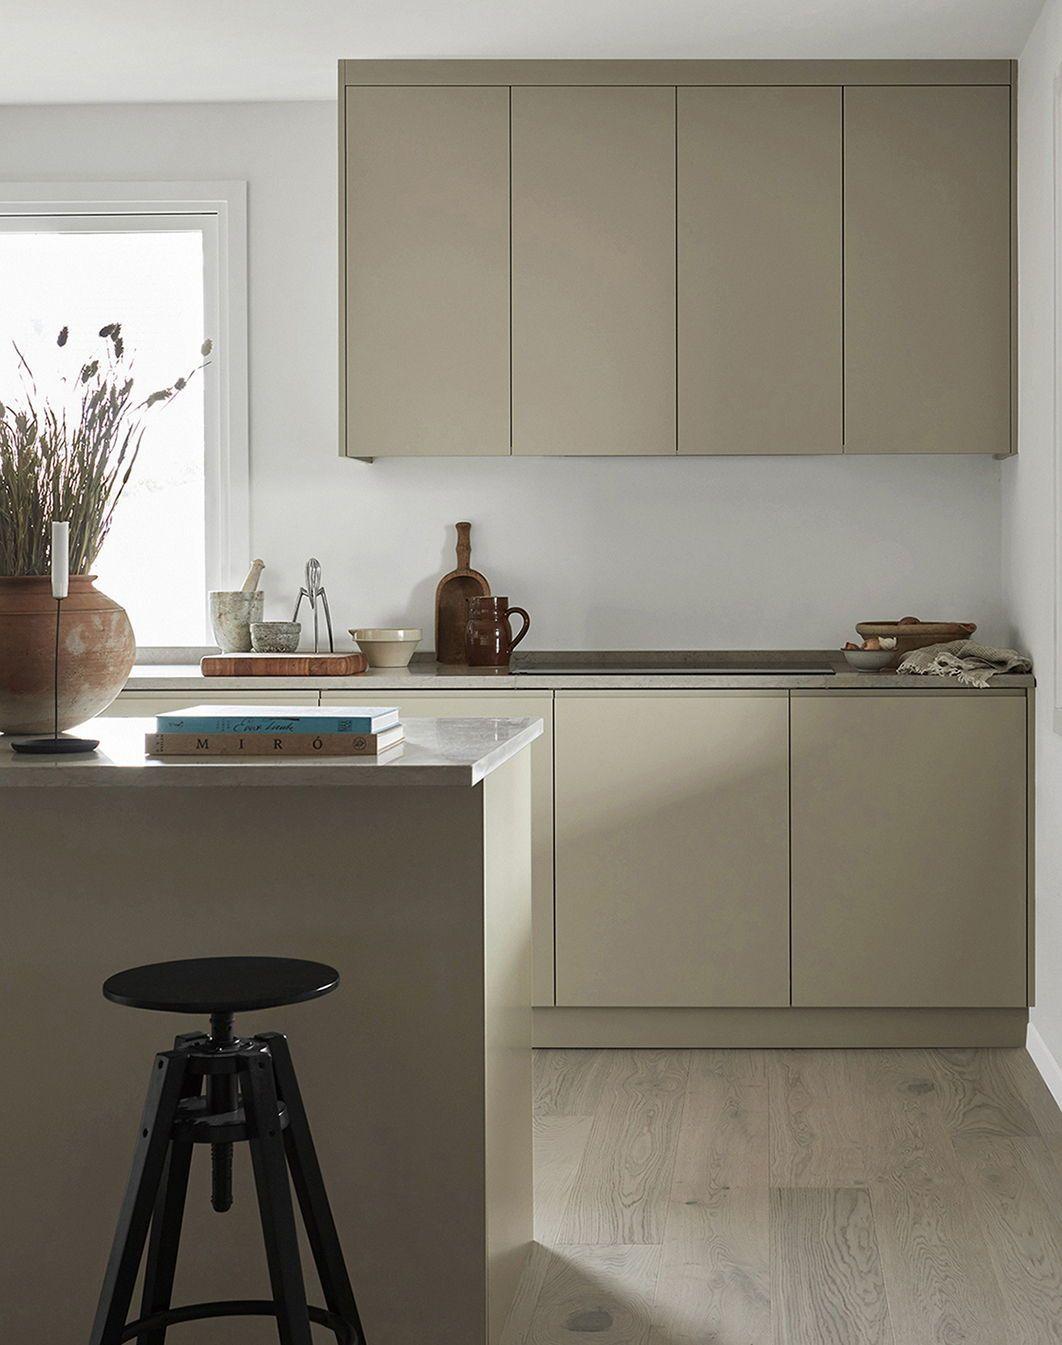 Cheap Rustic Decor – SalePrice:37$ Kitchen